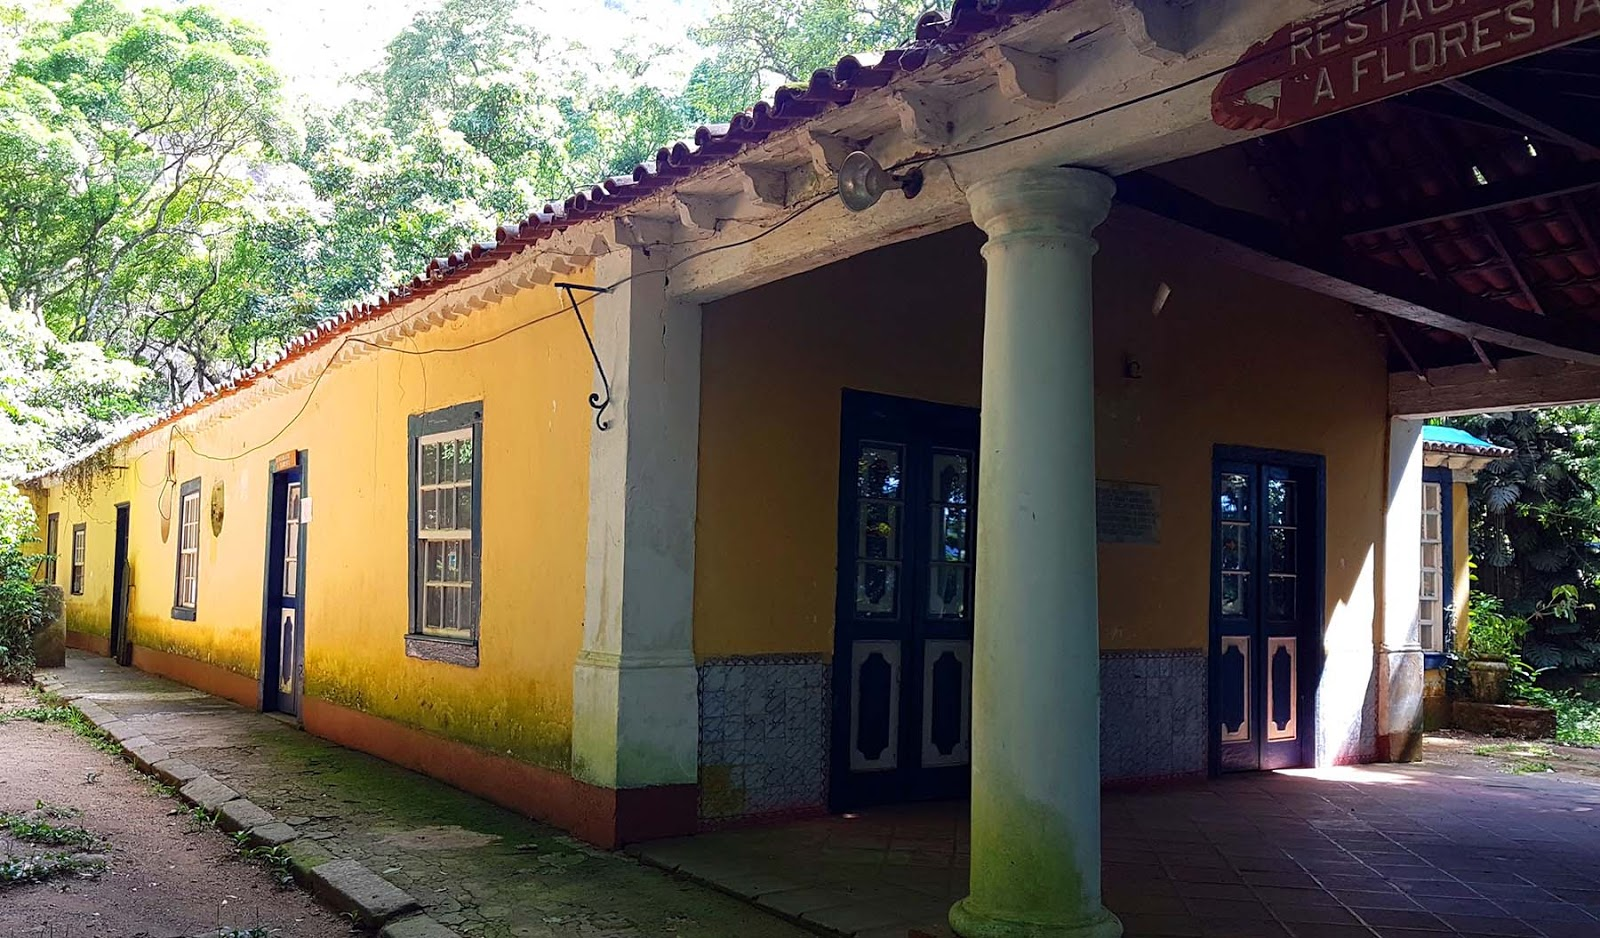 Restaurante A Floresta na Floresta da Tijuca.